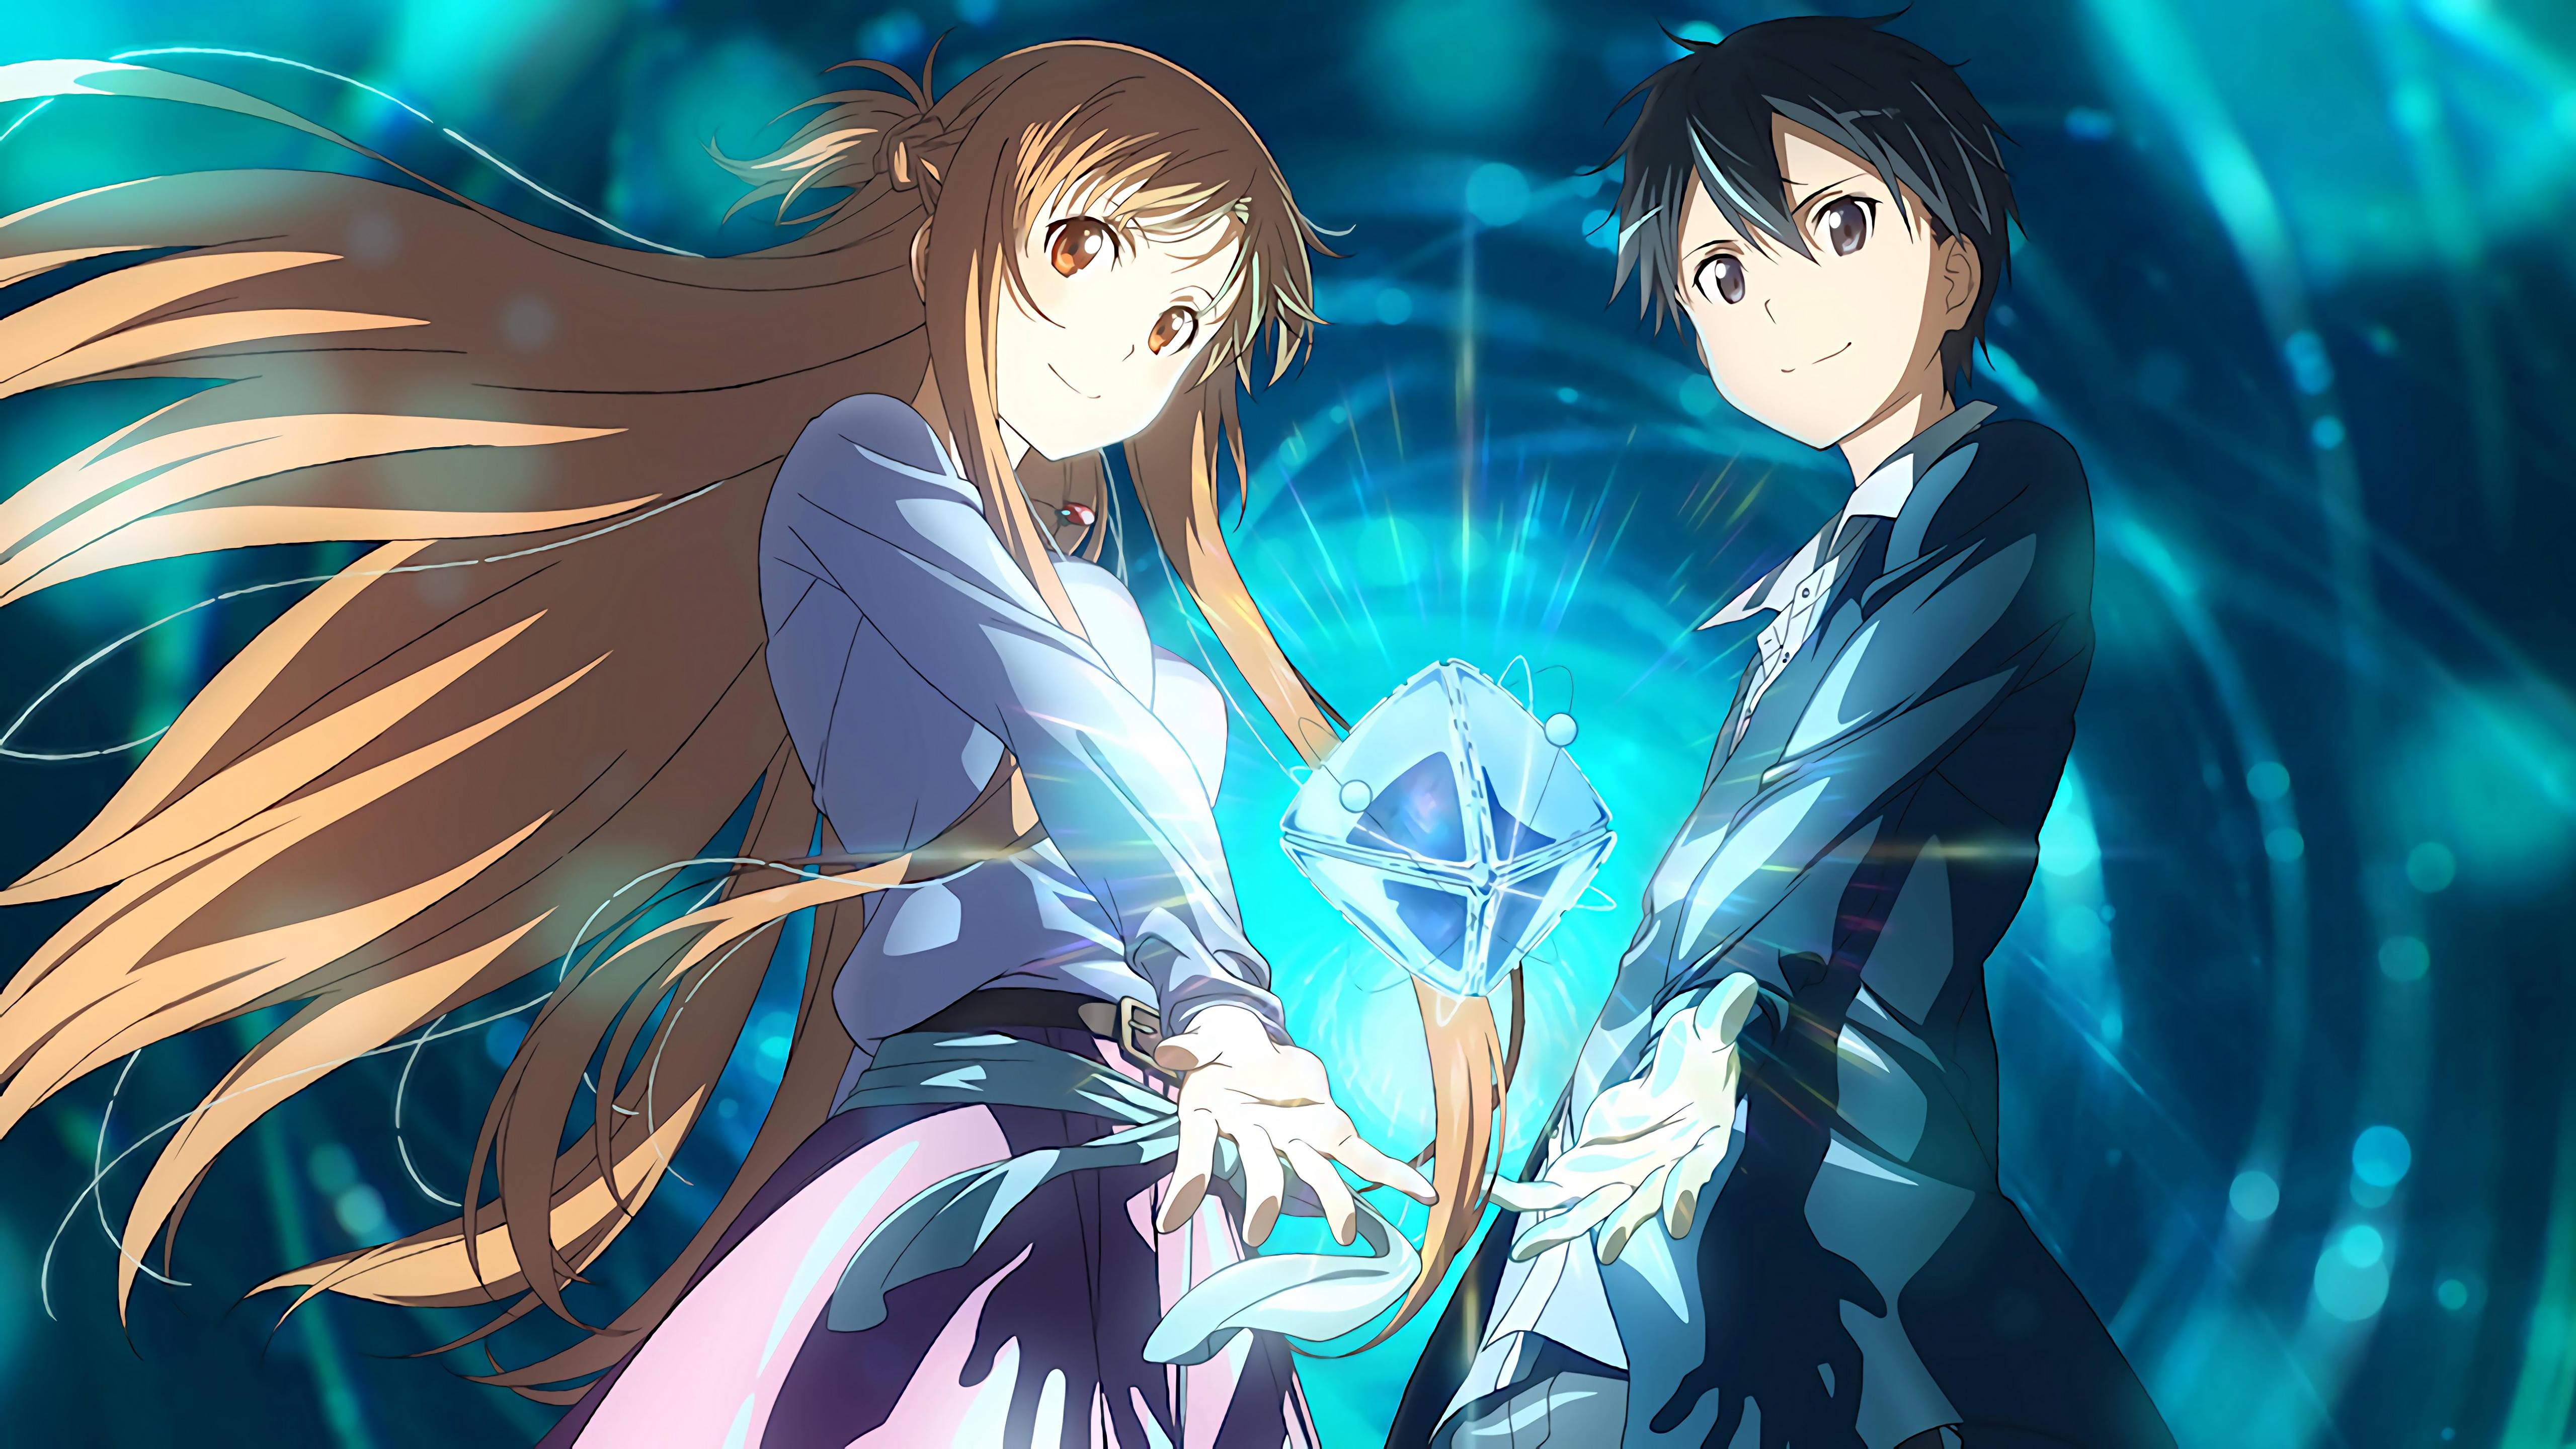 Kirito And Asuna From Sword Art Online Anime Wallpaper 5k Ultra Hd